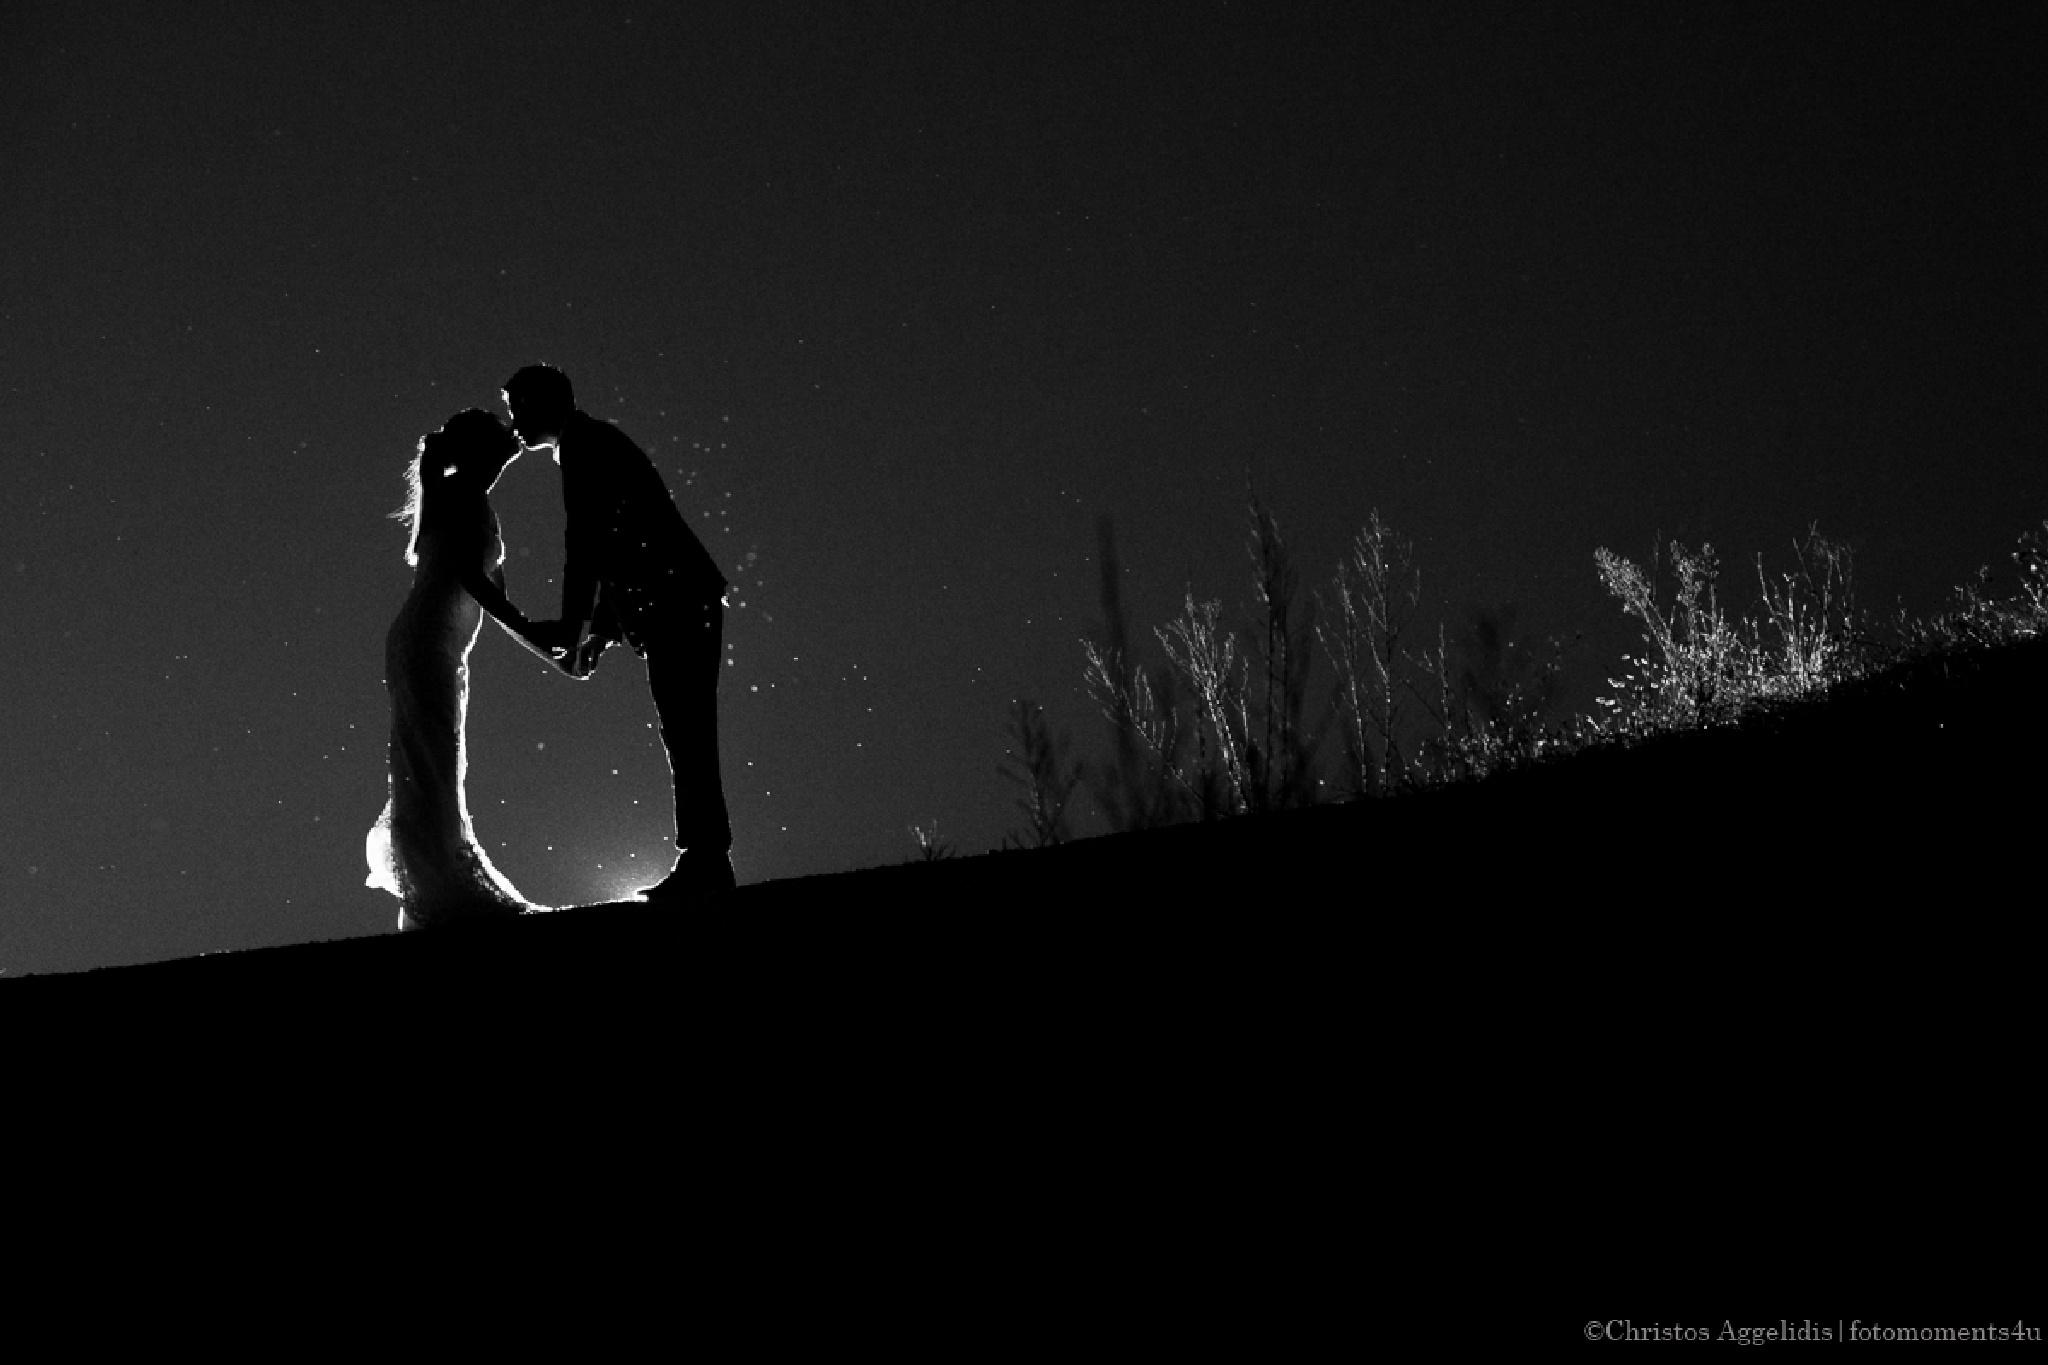 Shadows of love by Christos Aggelidis